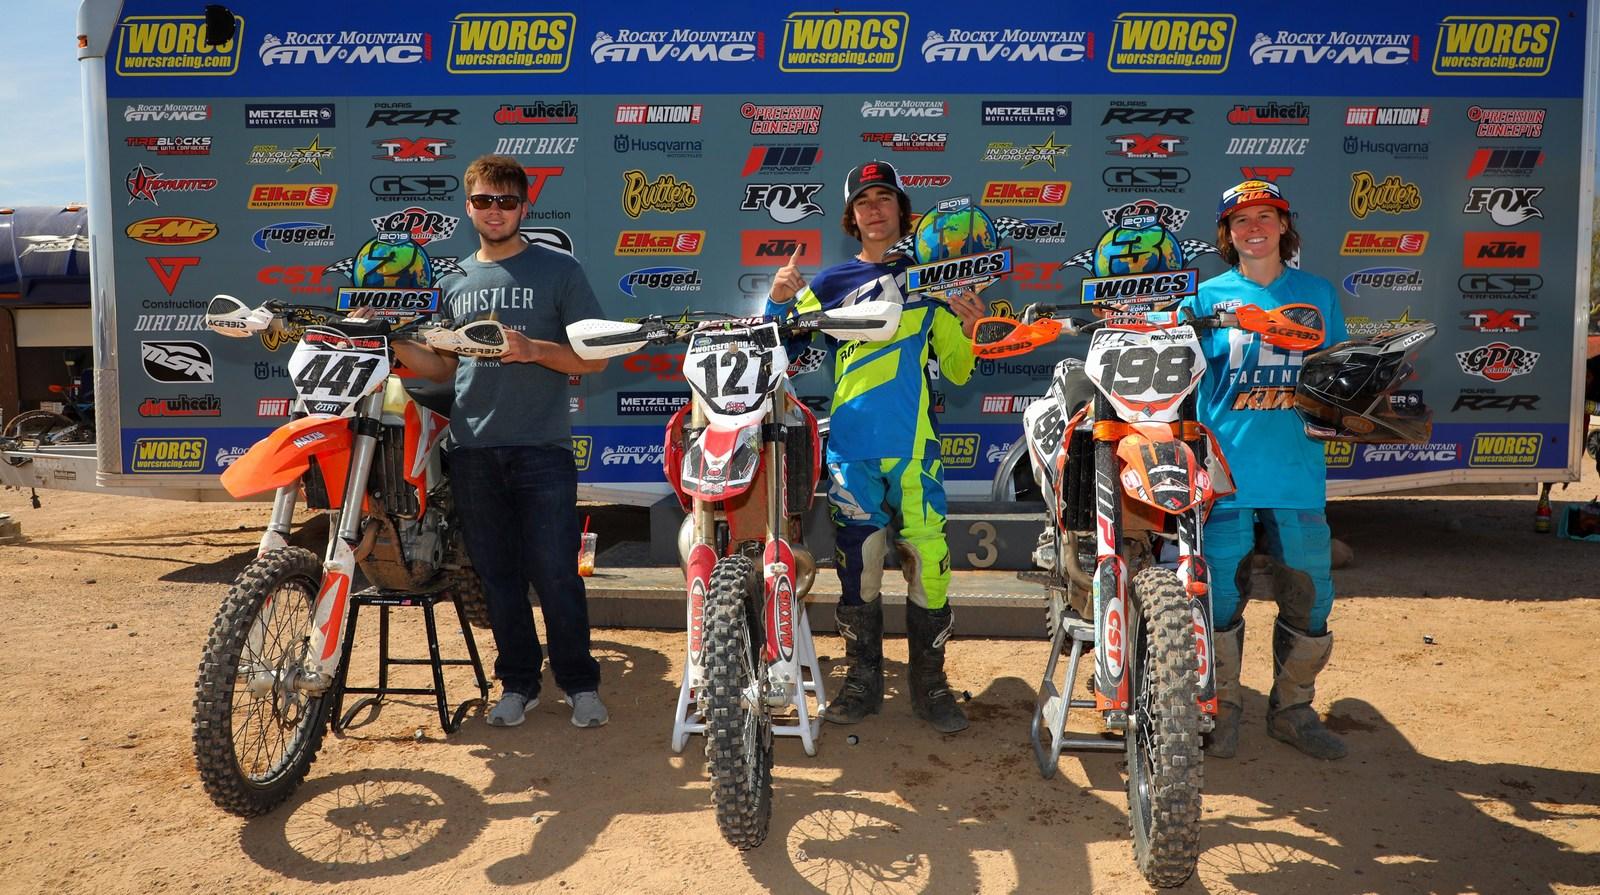 2019-04-podium-pro-lights-bike-worcs-racing